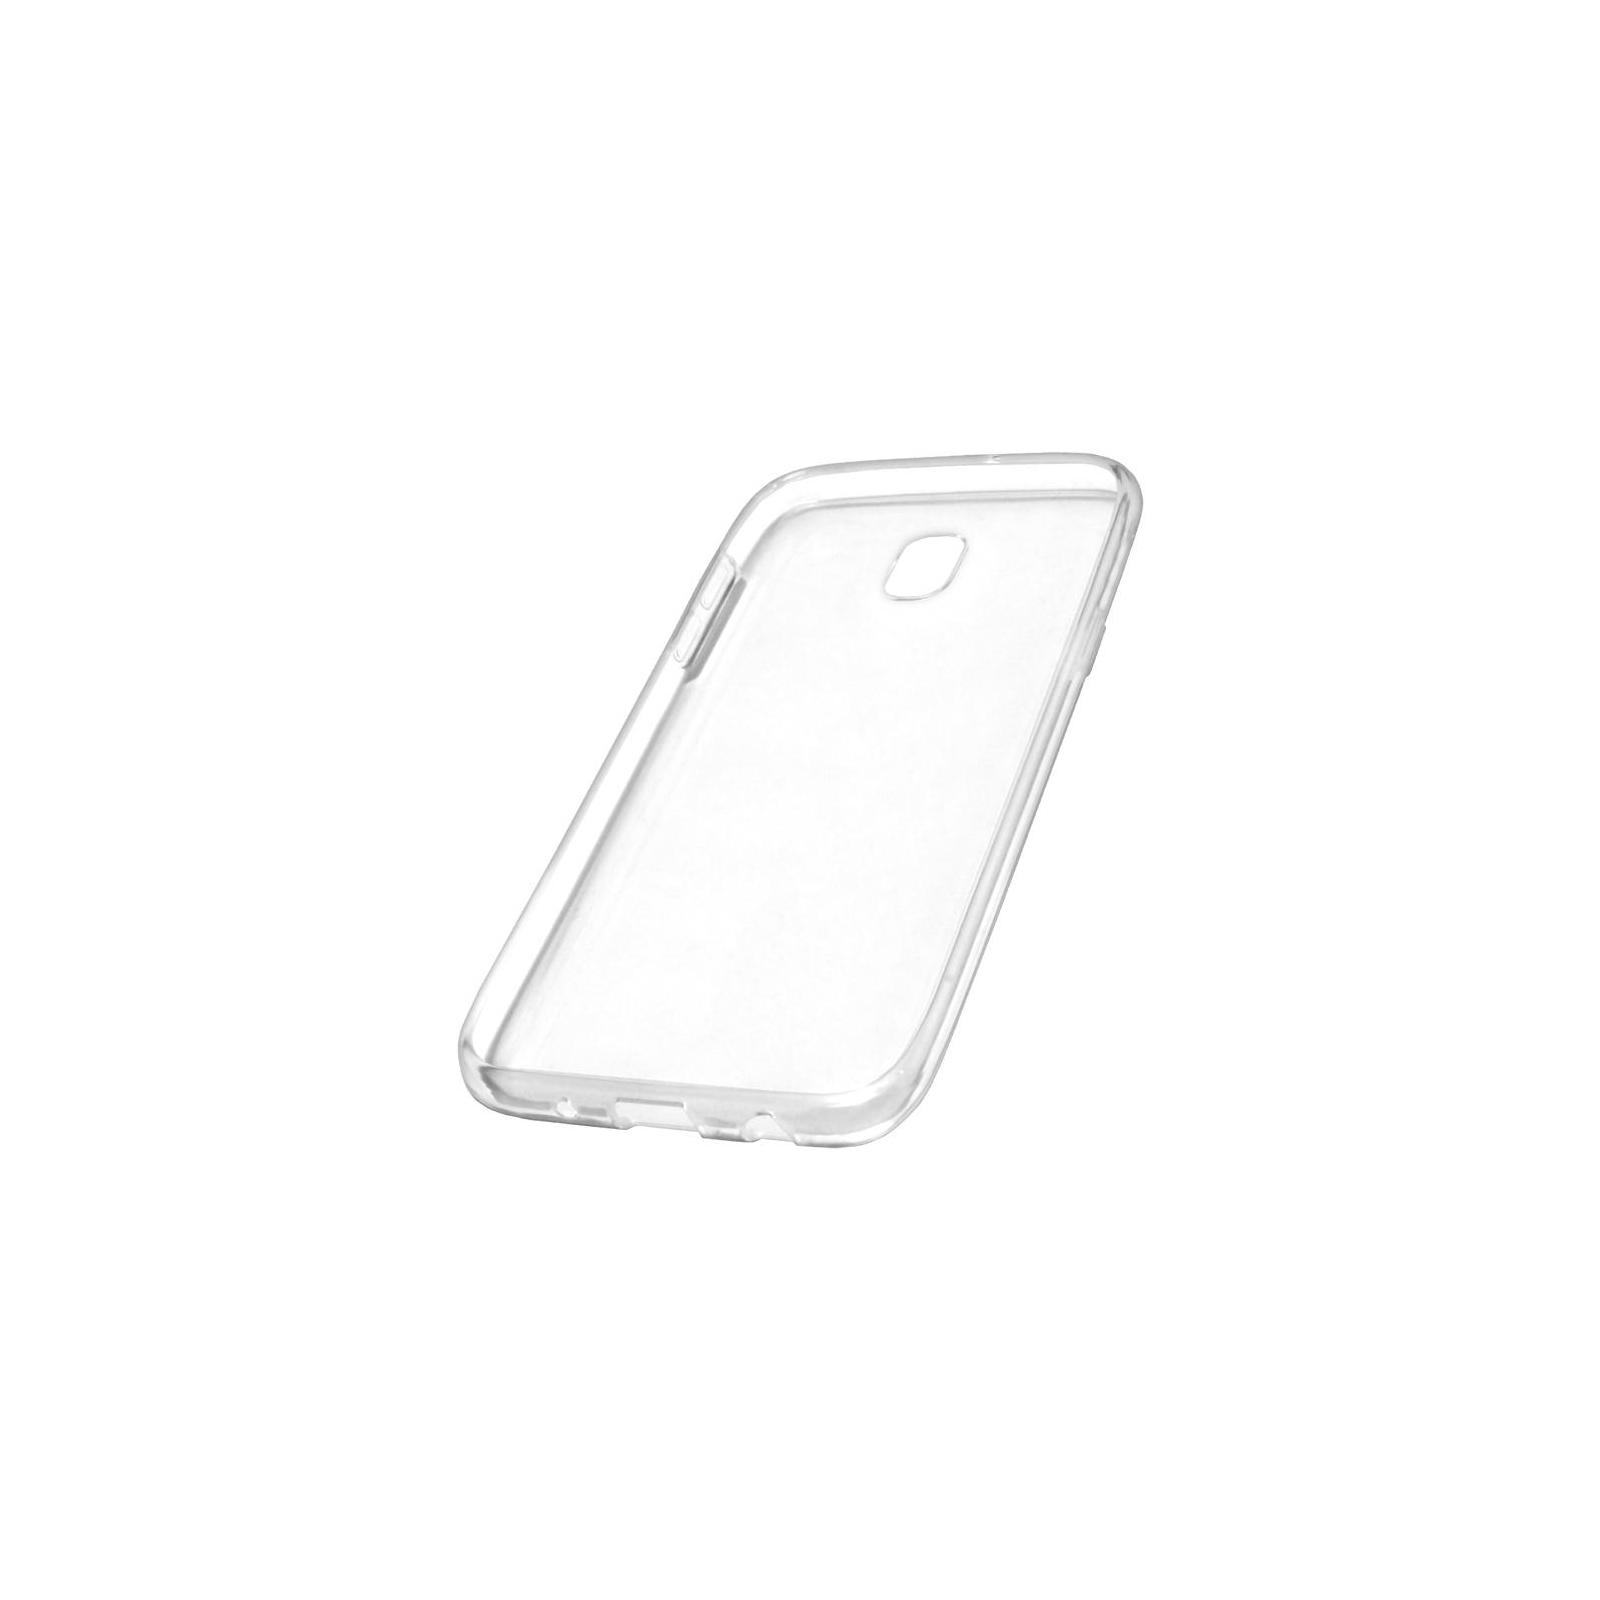 Чехол для моб. телефона SmartCase Samsung Galaxy J5 / J530 TPU Clear (SC-J530) изображение 2